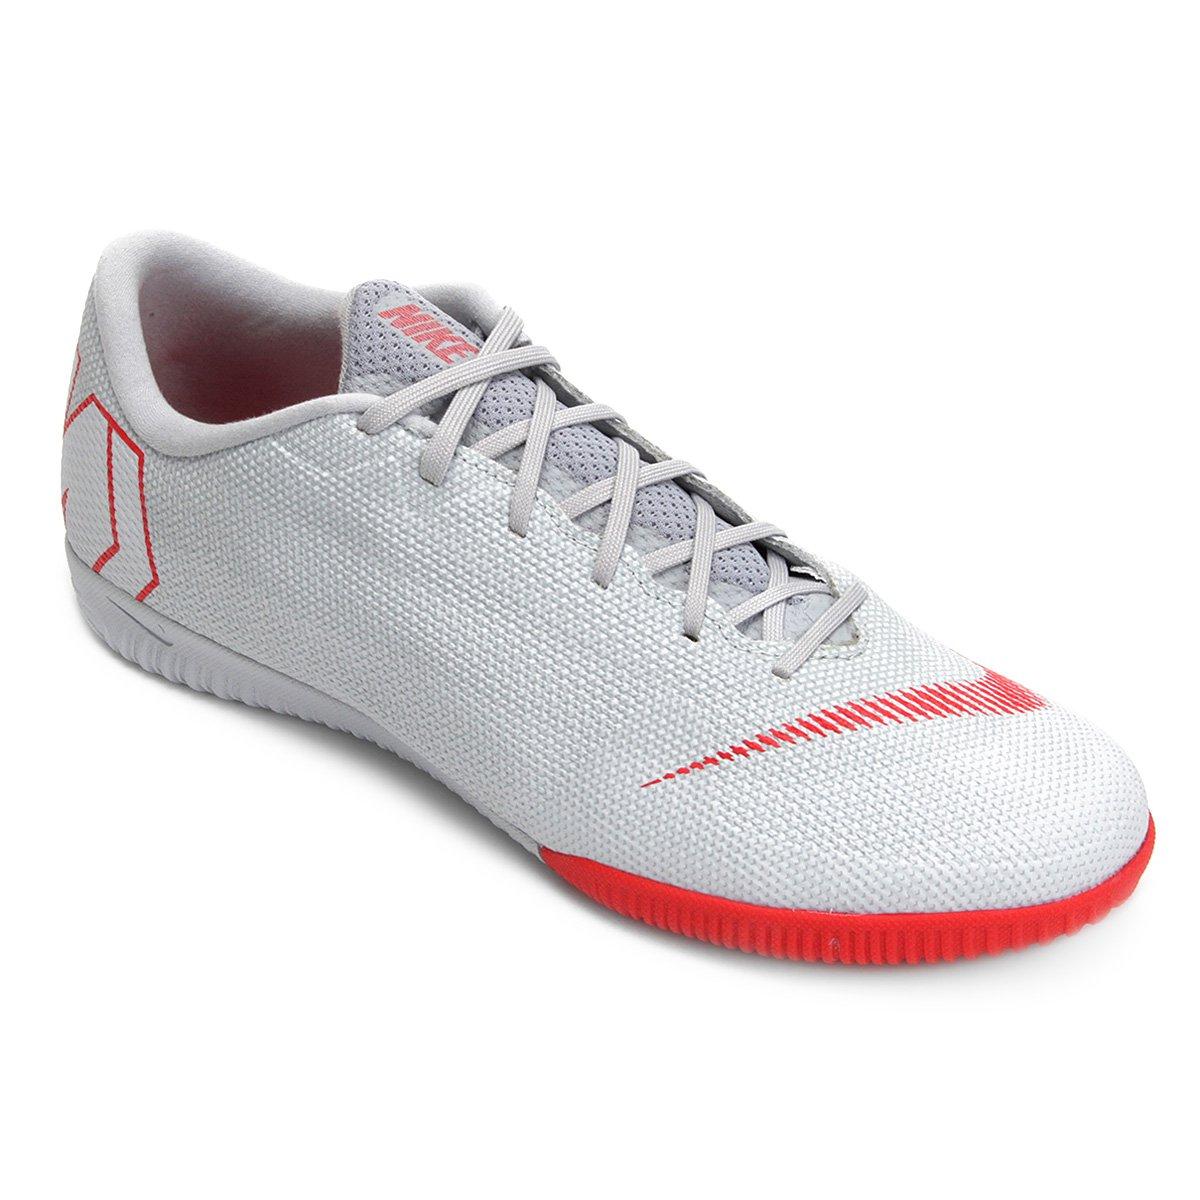 b707507caa2 Chuteira Futsal Nike Mercurial Vapor 12 Academy - Cinza - Compre ...